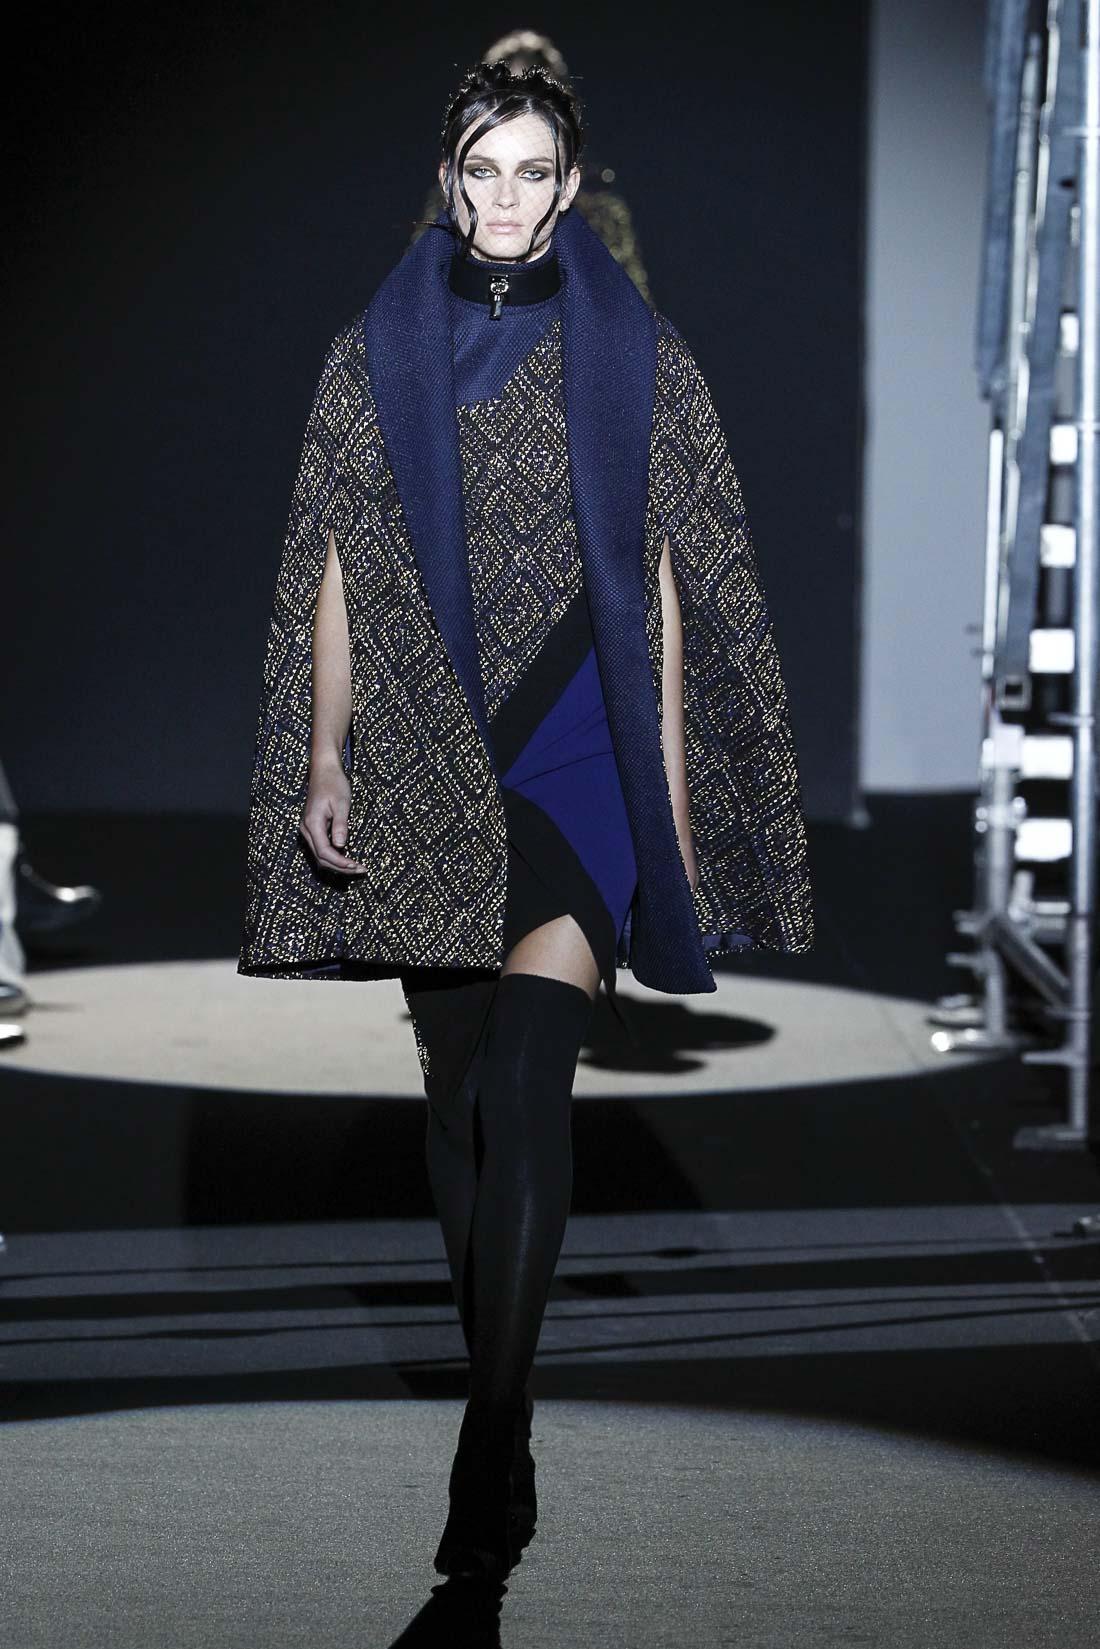 ALVARNO O/I 2016-2017 Foto vía Vogue